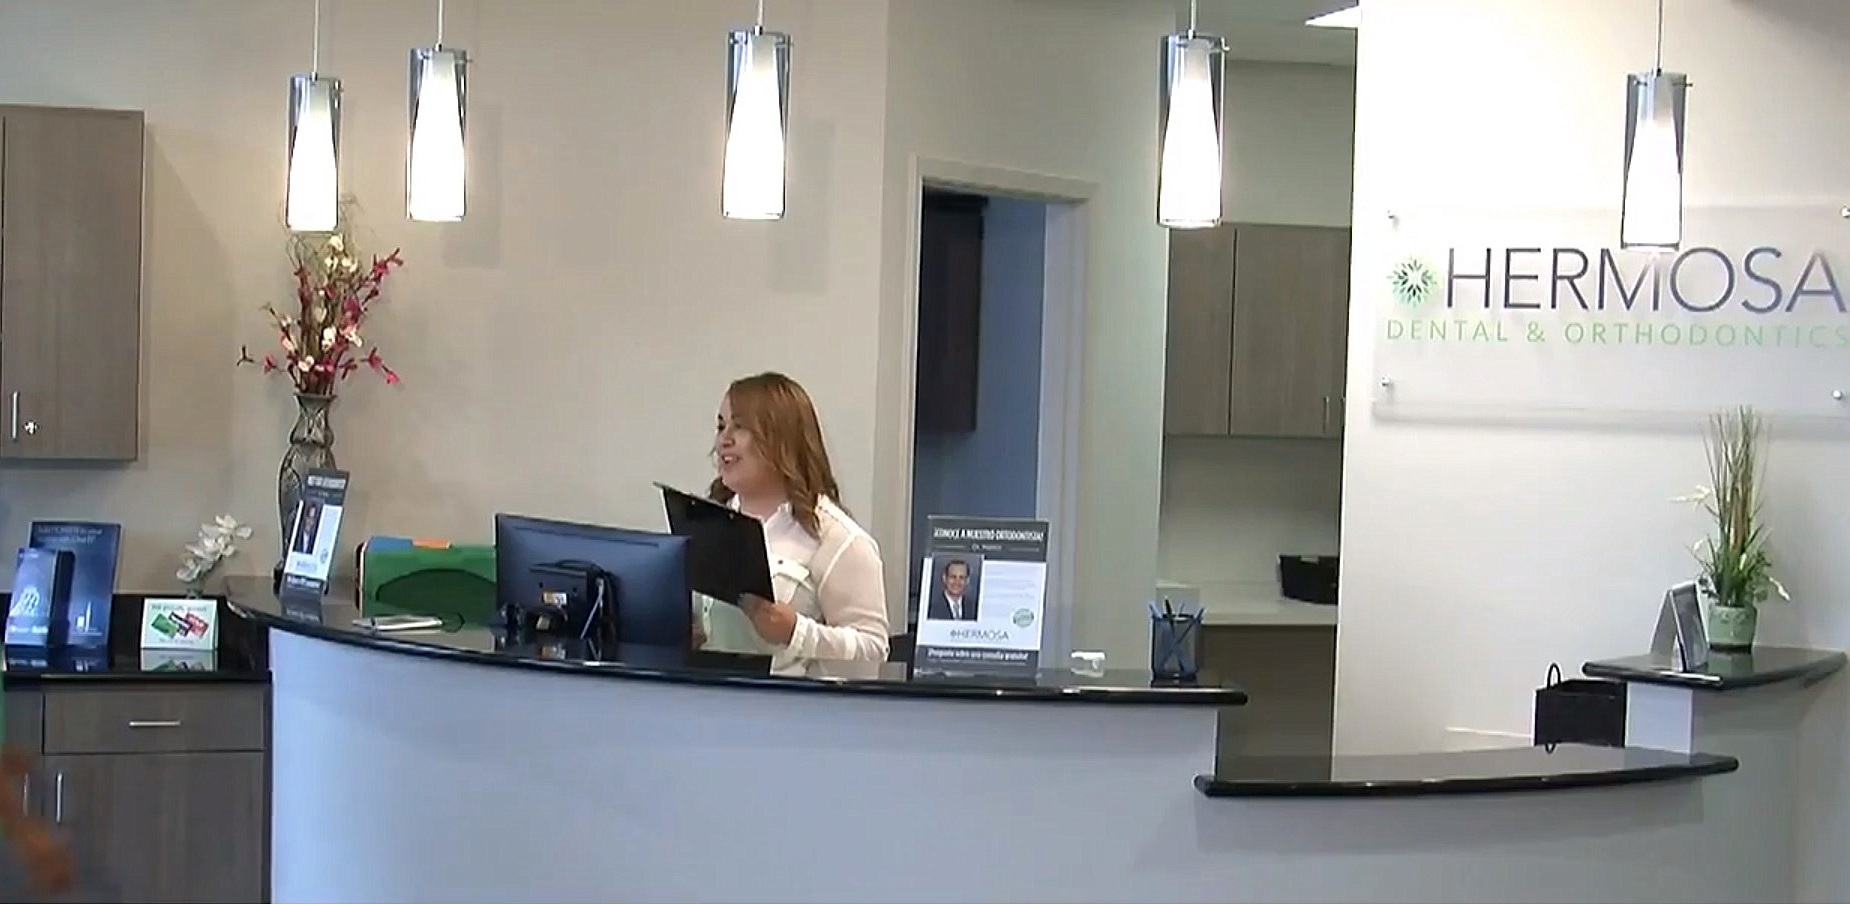 Staff at Dallas Dentist Hermosa Dental Orthodontics